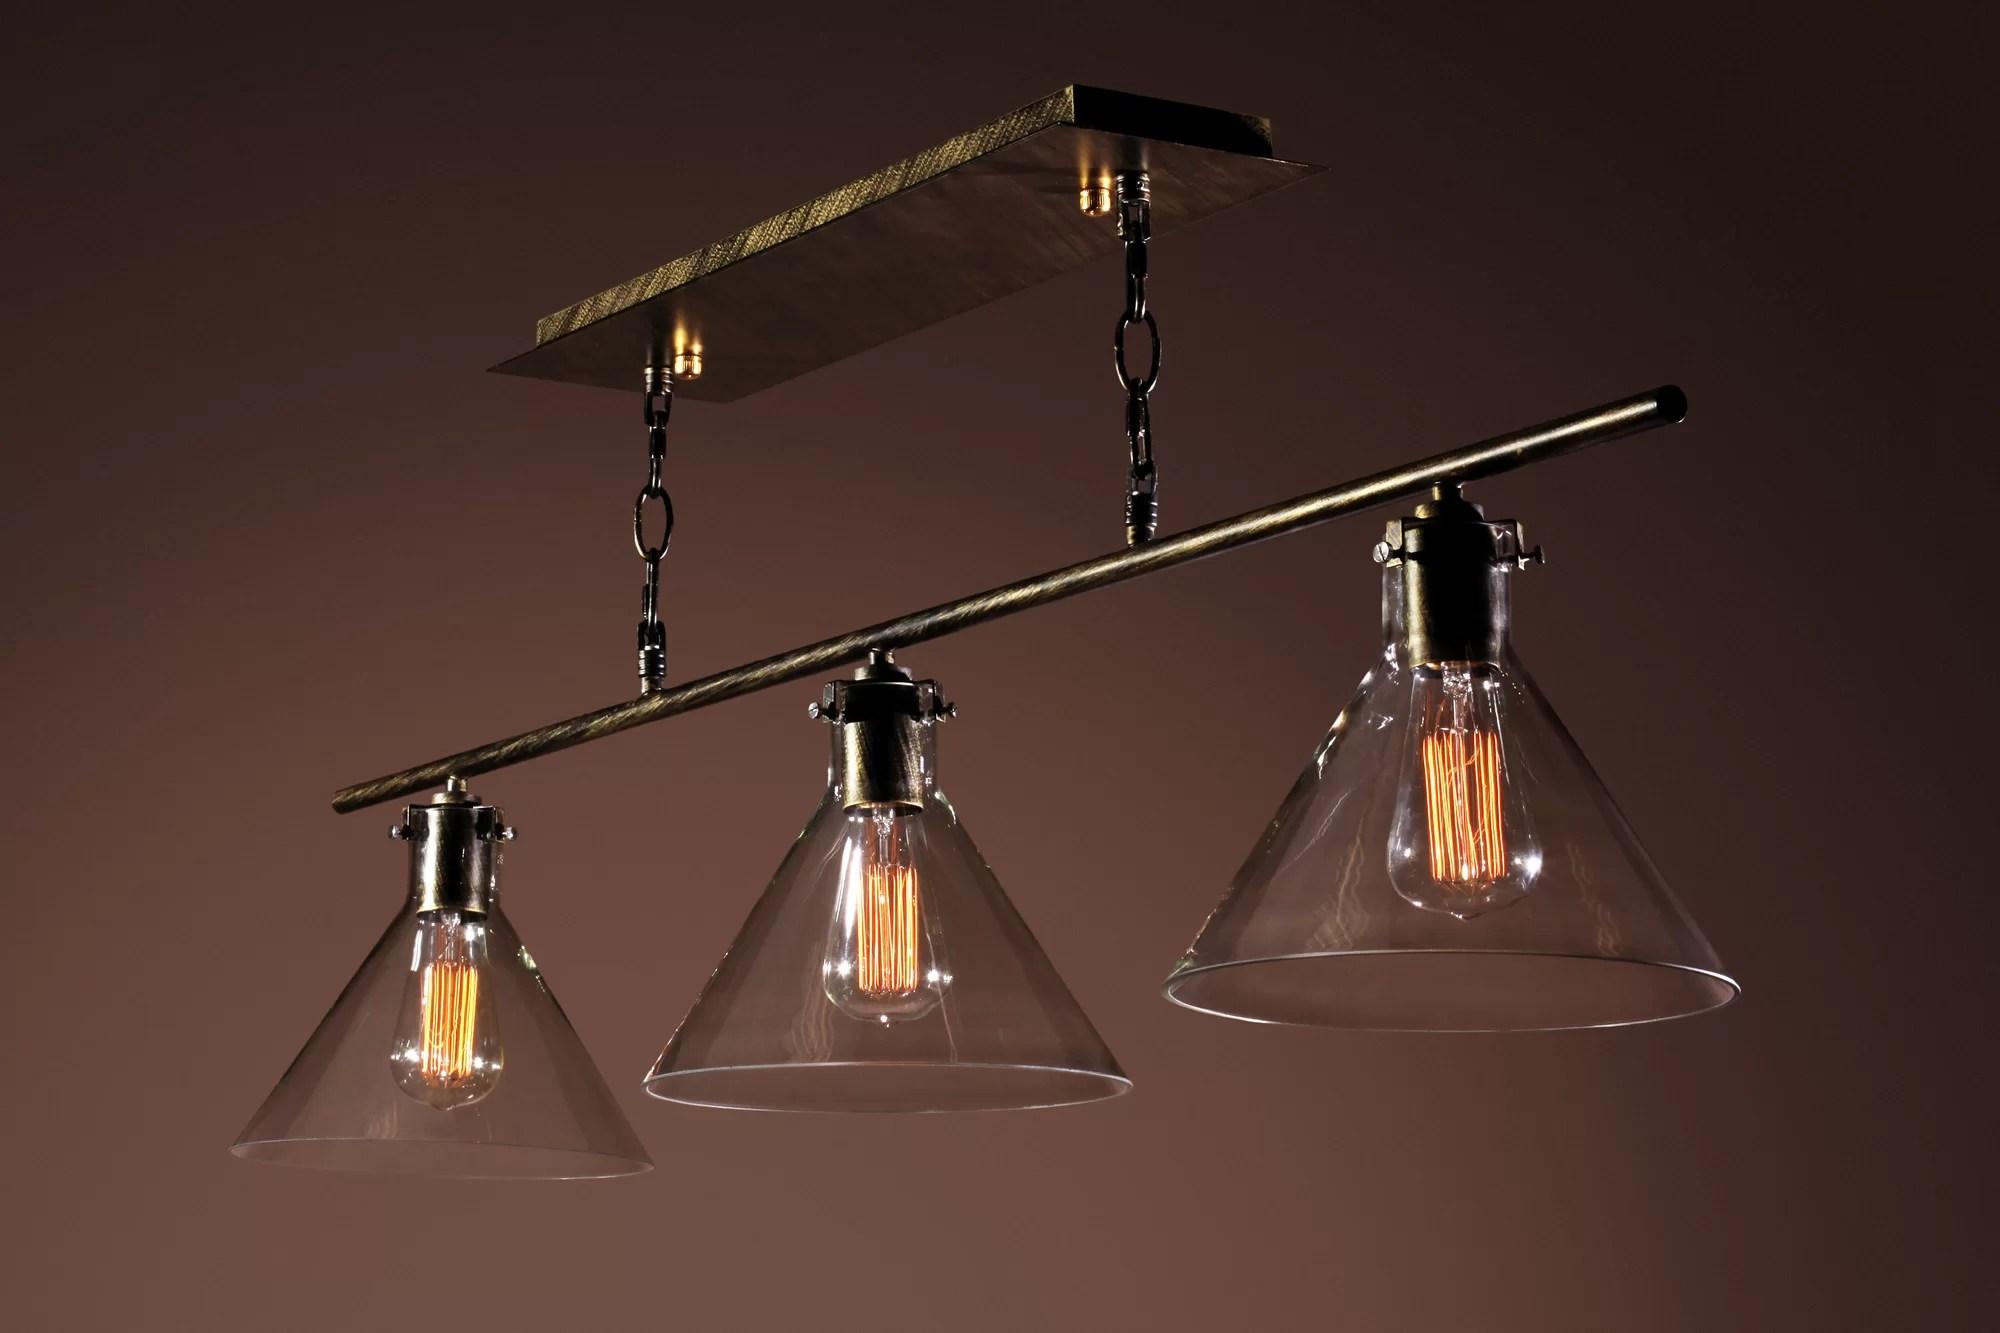 3 light kitchen island pendant aid sale warehouse of tiffany amerie